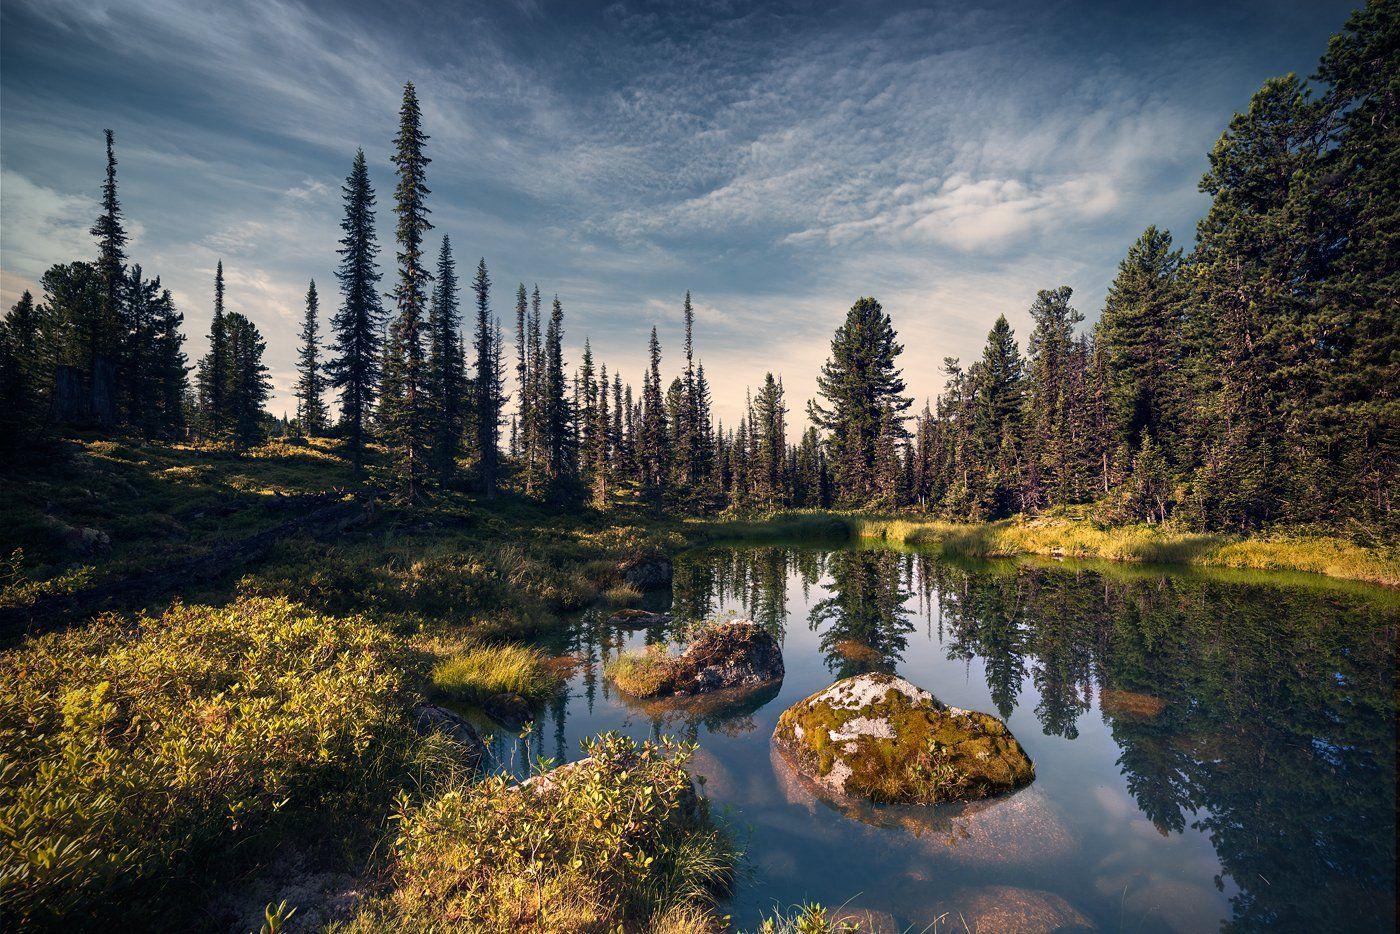 landscape, nature, taiga, lake, forest, rocks, cold, spectacular, пейзаж, природа, тайга, лес, глухая, красивая, озеро, камни, холодное, pure, transparent, morning, moss, чистое, прозрачное, утро, мох, siberia, ergaki, сибирь, ергаки, красноярский край, Дмитрий Антипов